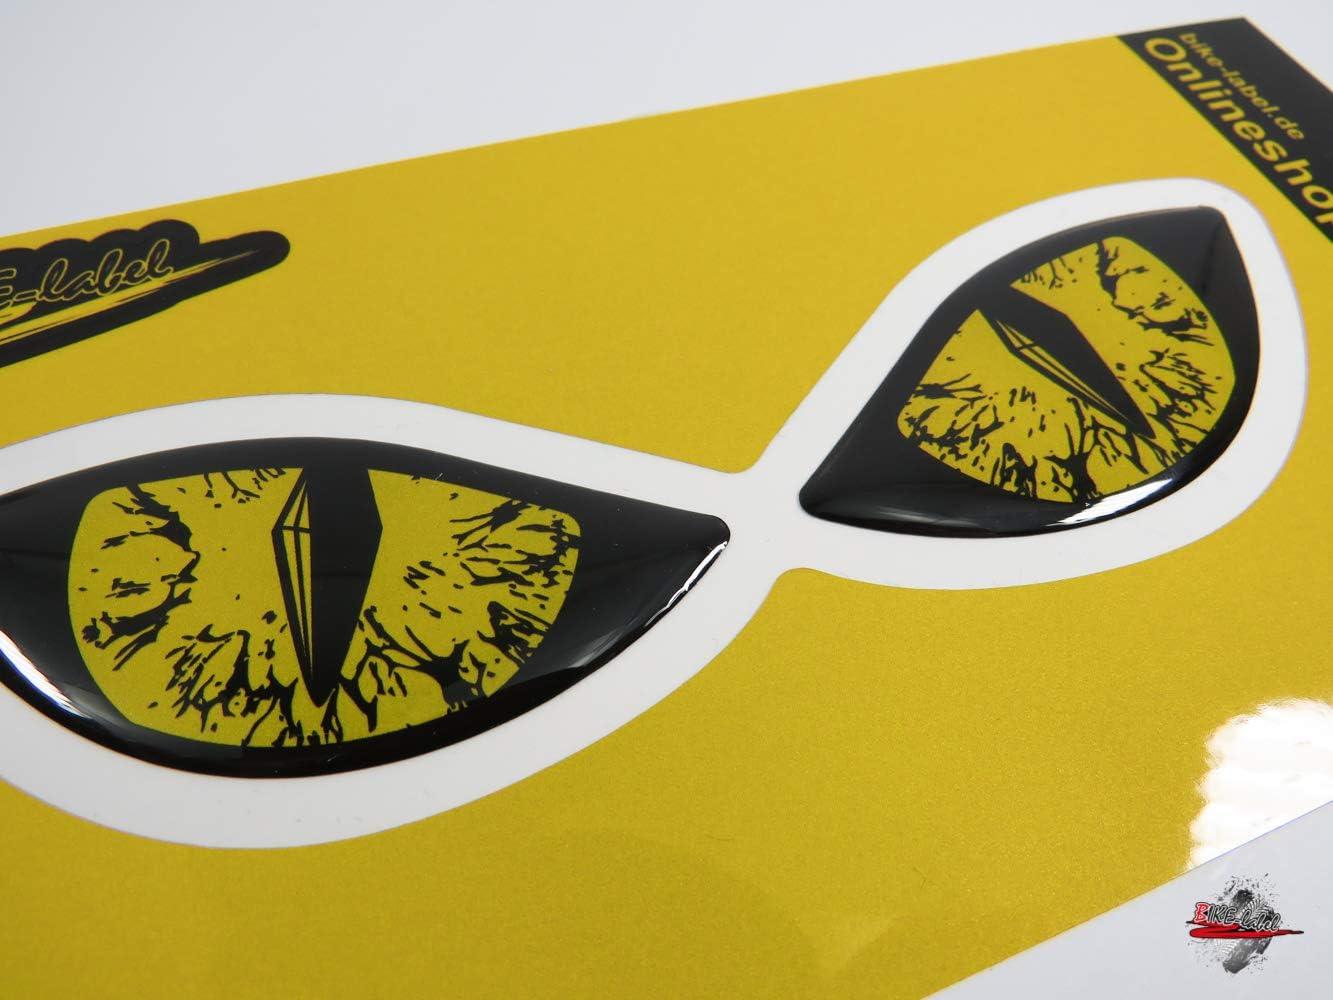 Bike Label 910066va Reflektor Aufkleber 3d Böse Augen Auto Motorrad Helm Gelb Auto